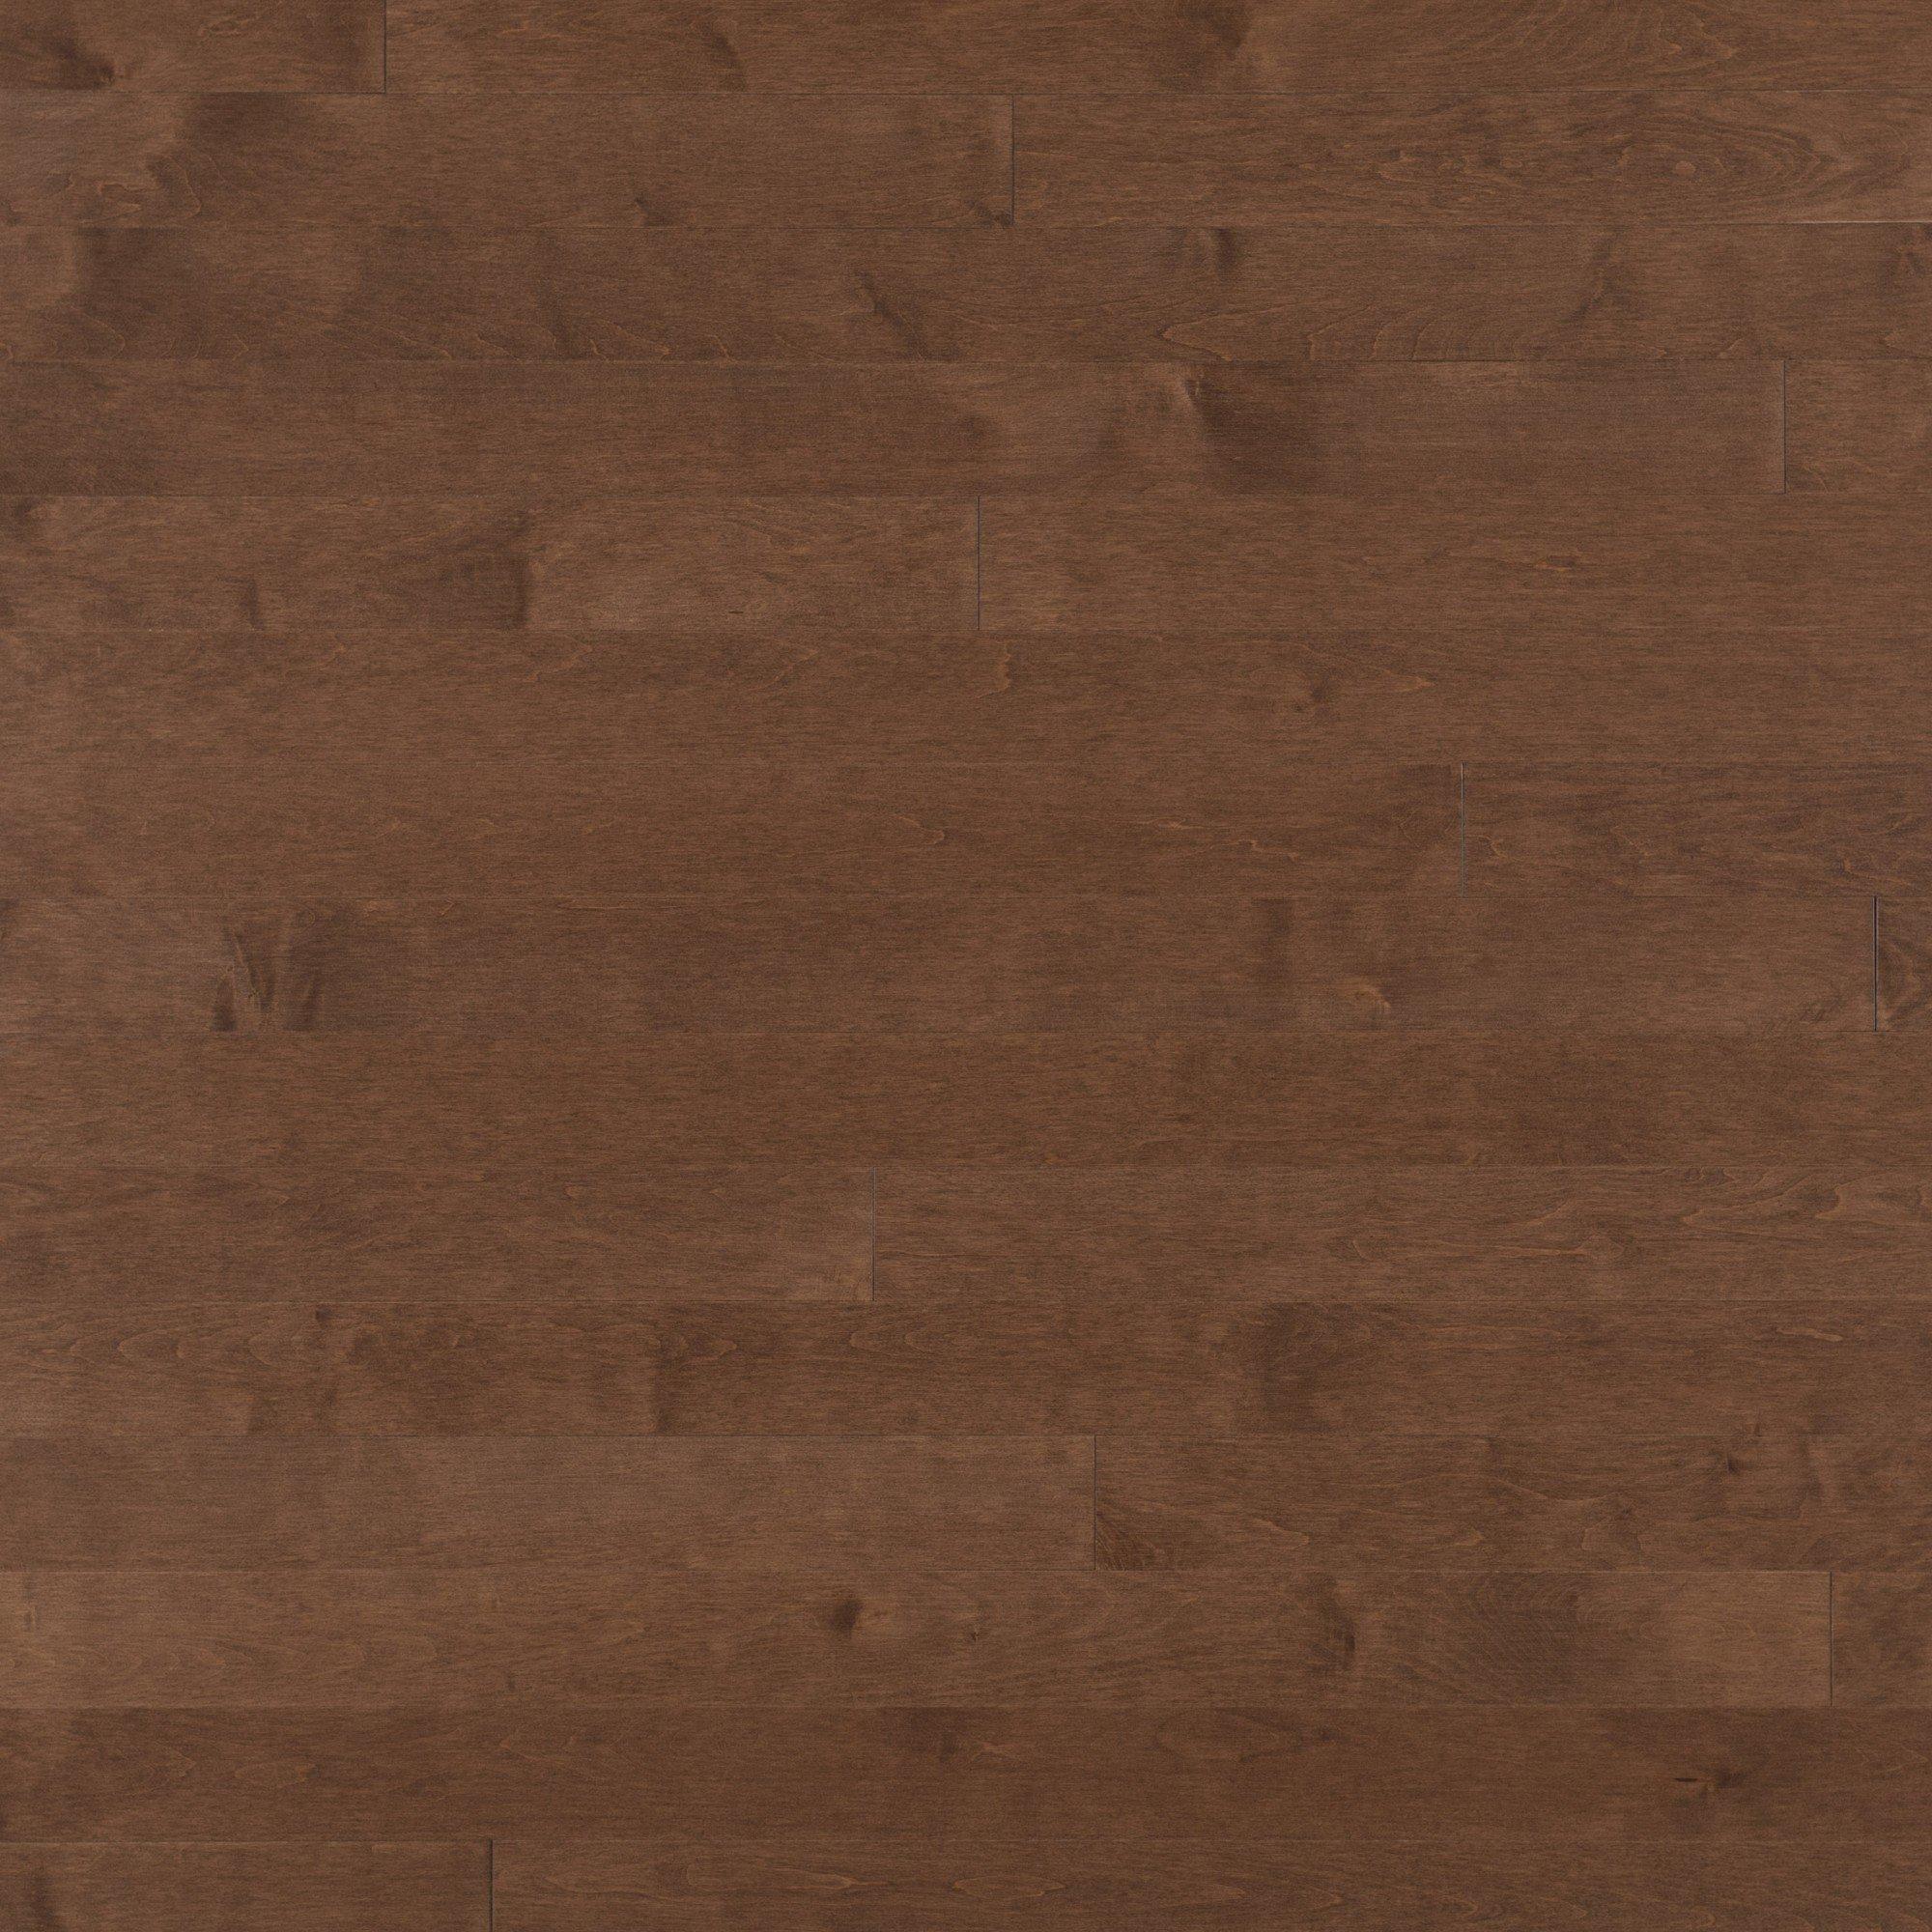 Admiration Maple North Hatley Mirage Hardwood Floors